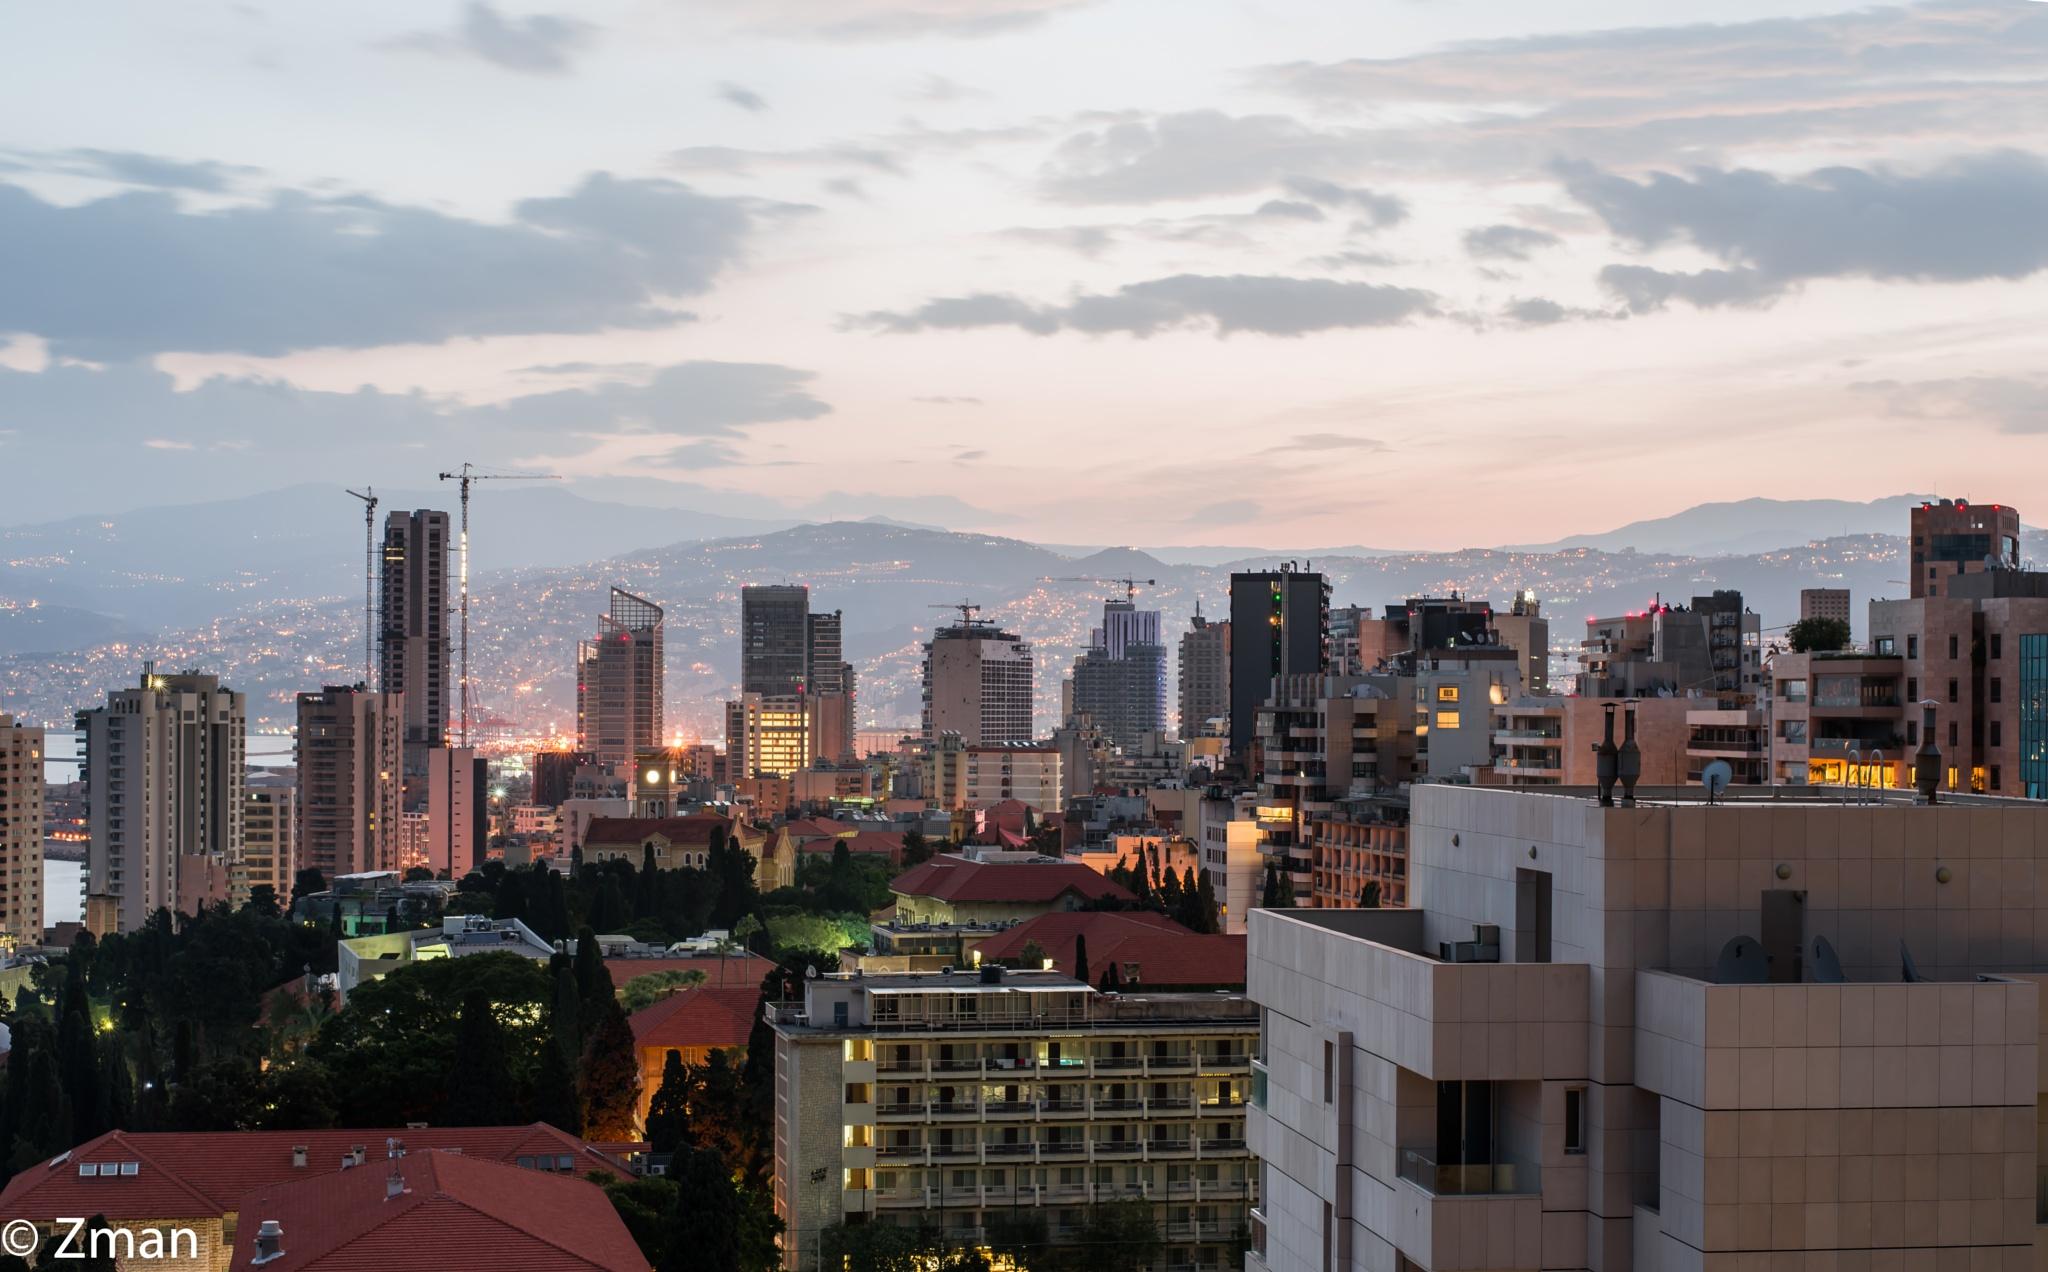 Beirut My City at Daybreak by muhammad.nasser.963